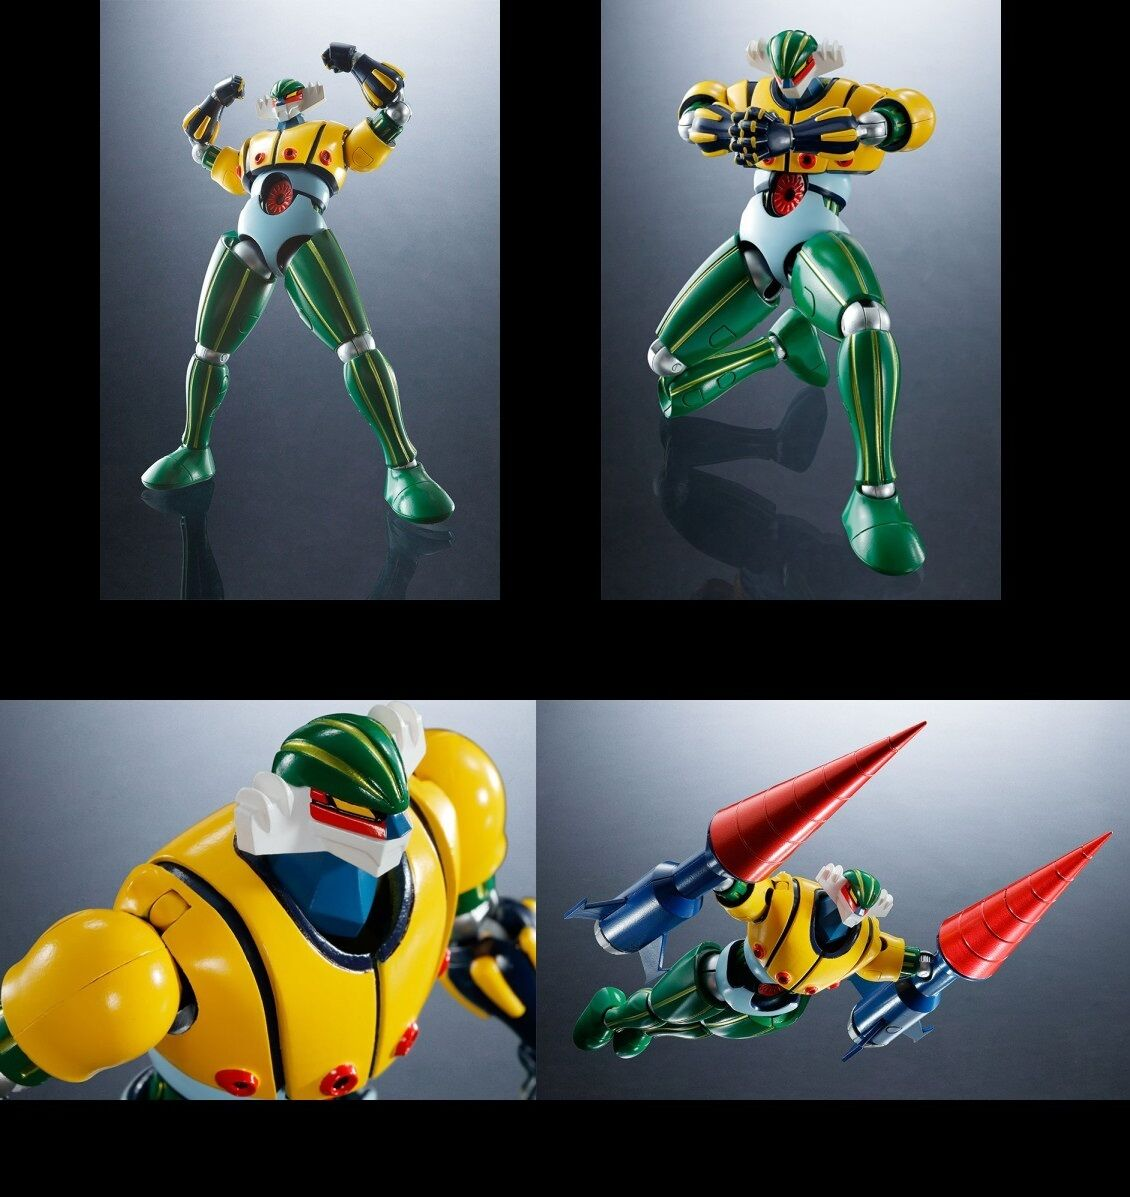 -=] BANDAI - Kotetsu Jeeg Robot d'Acciaio Super Robot Chogokin [=-